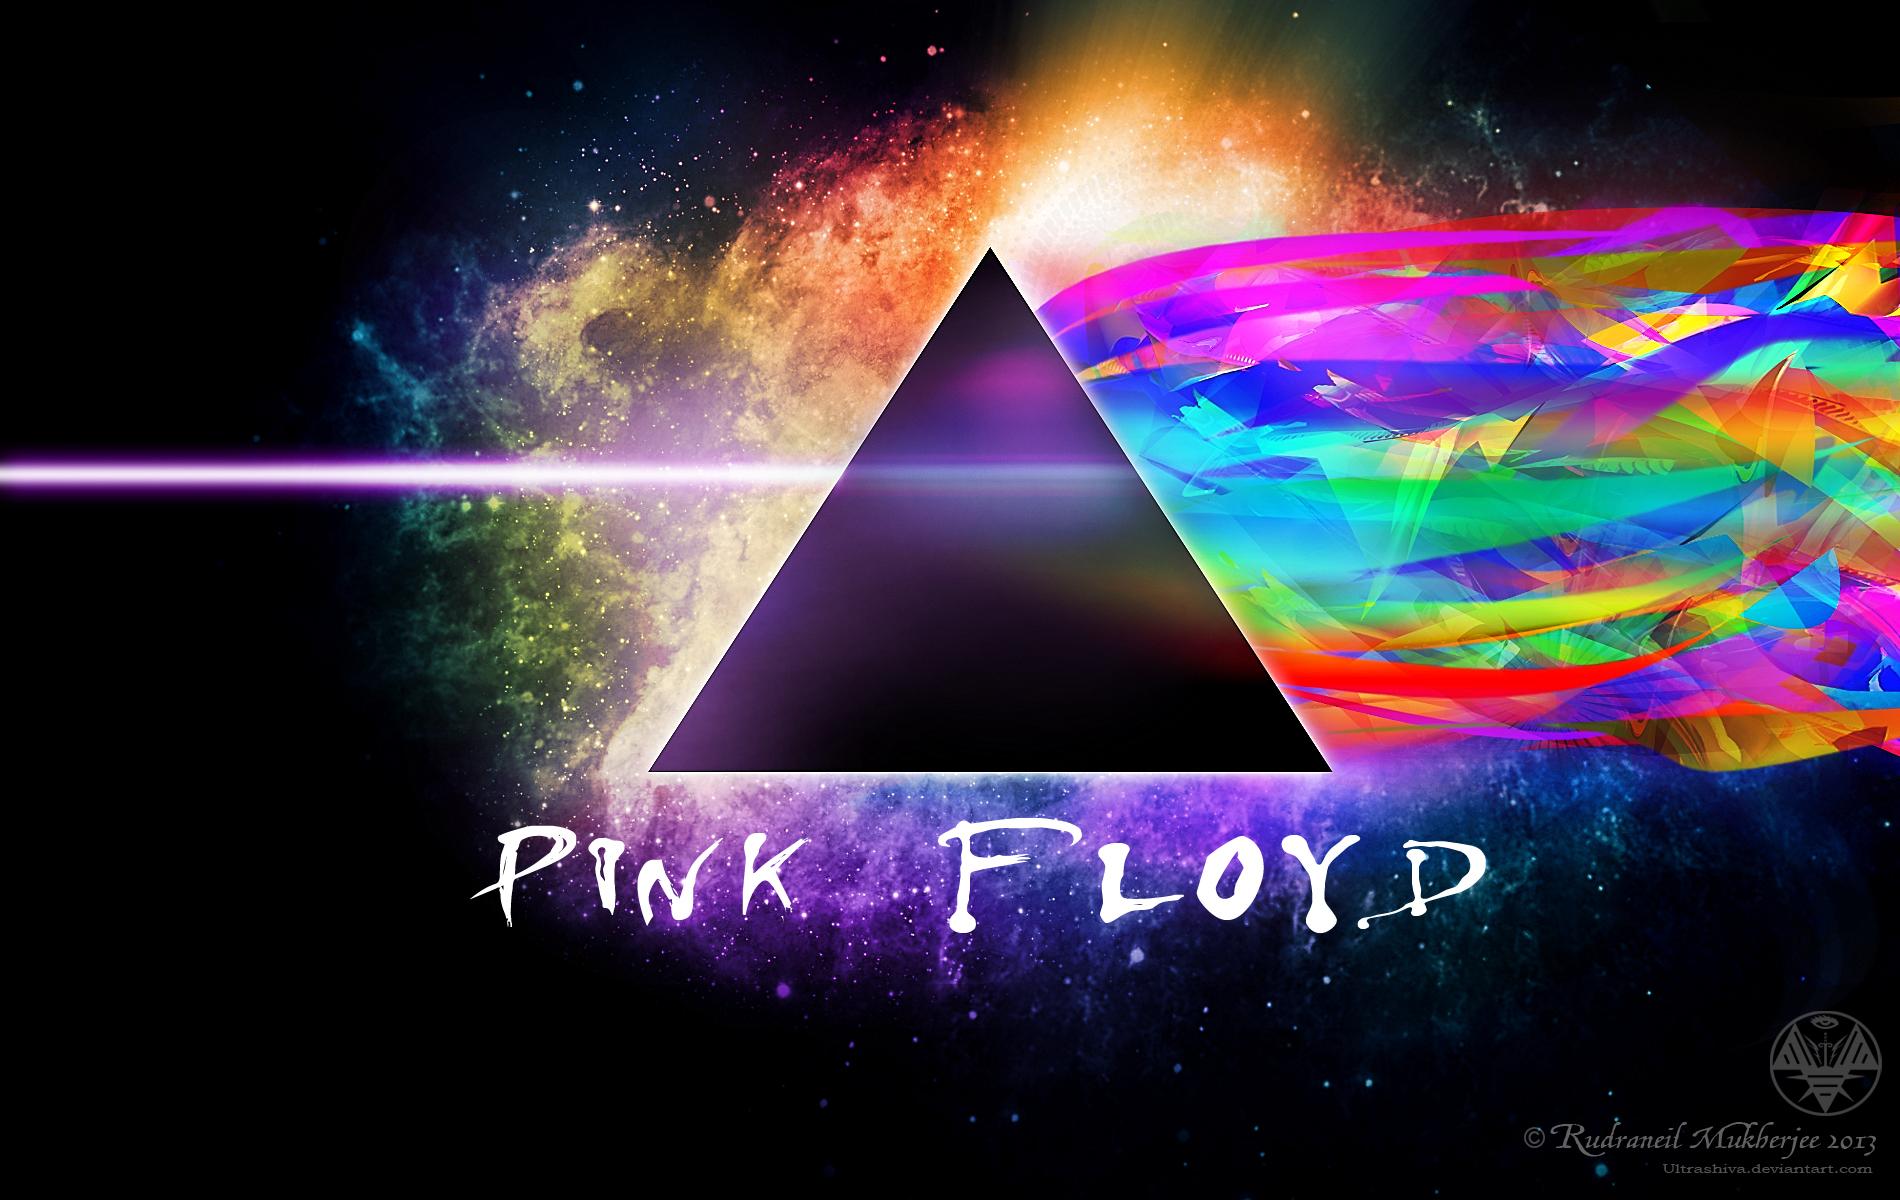 Pink Floyd Wallpaper High Resolution Pink floyd wallpaper 1 by 1900x1200